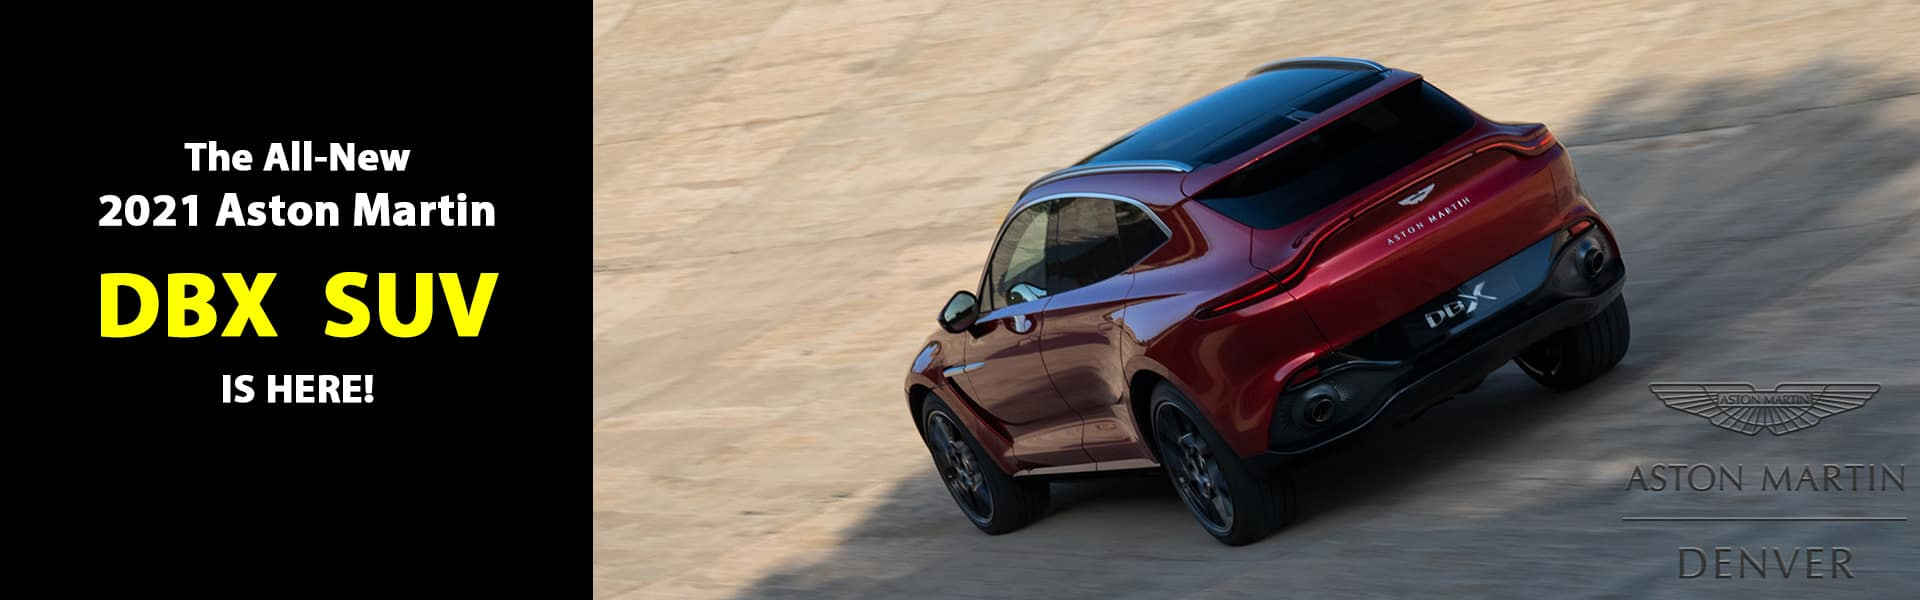 2021 Aston Martin DBX is for sale in Denver, Colorado